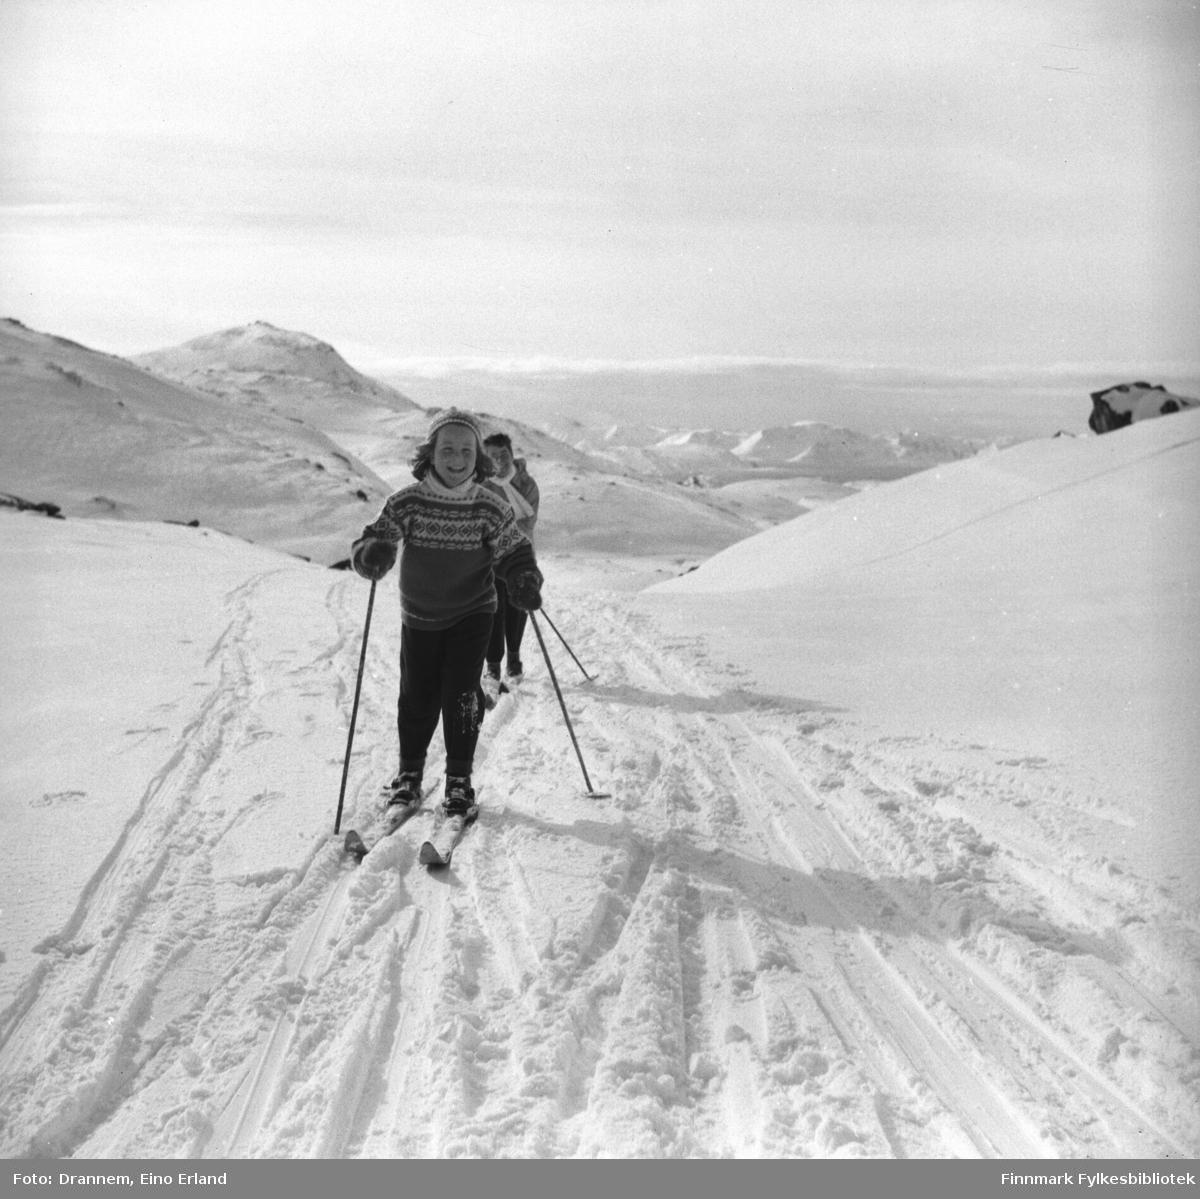 Påsketid. Turid Lillian med sin mor Jenny Drannem på ski i fjellet